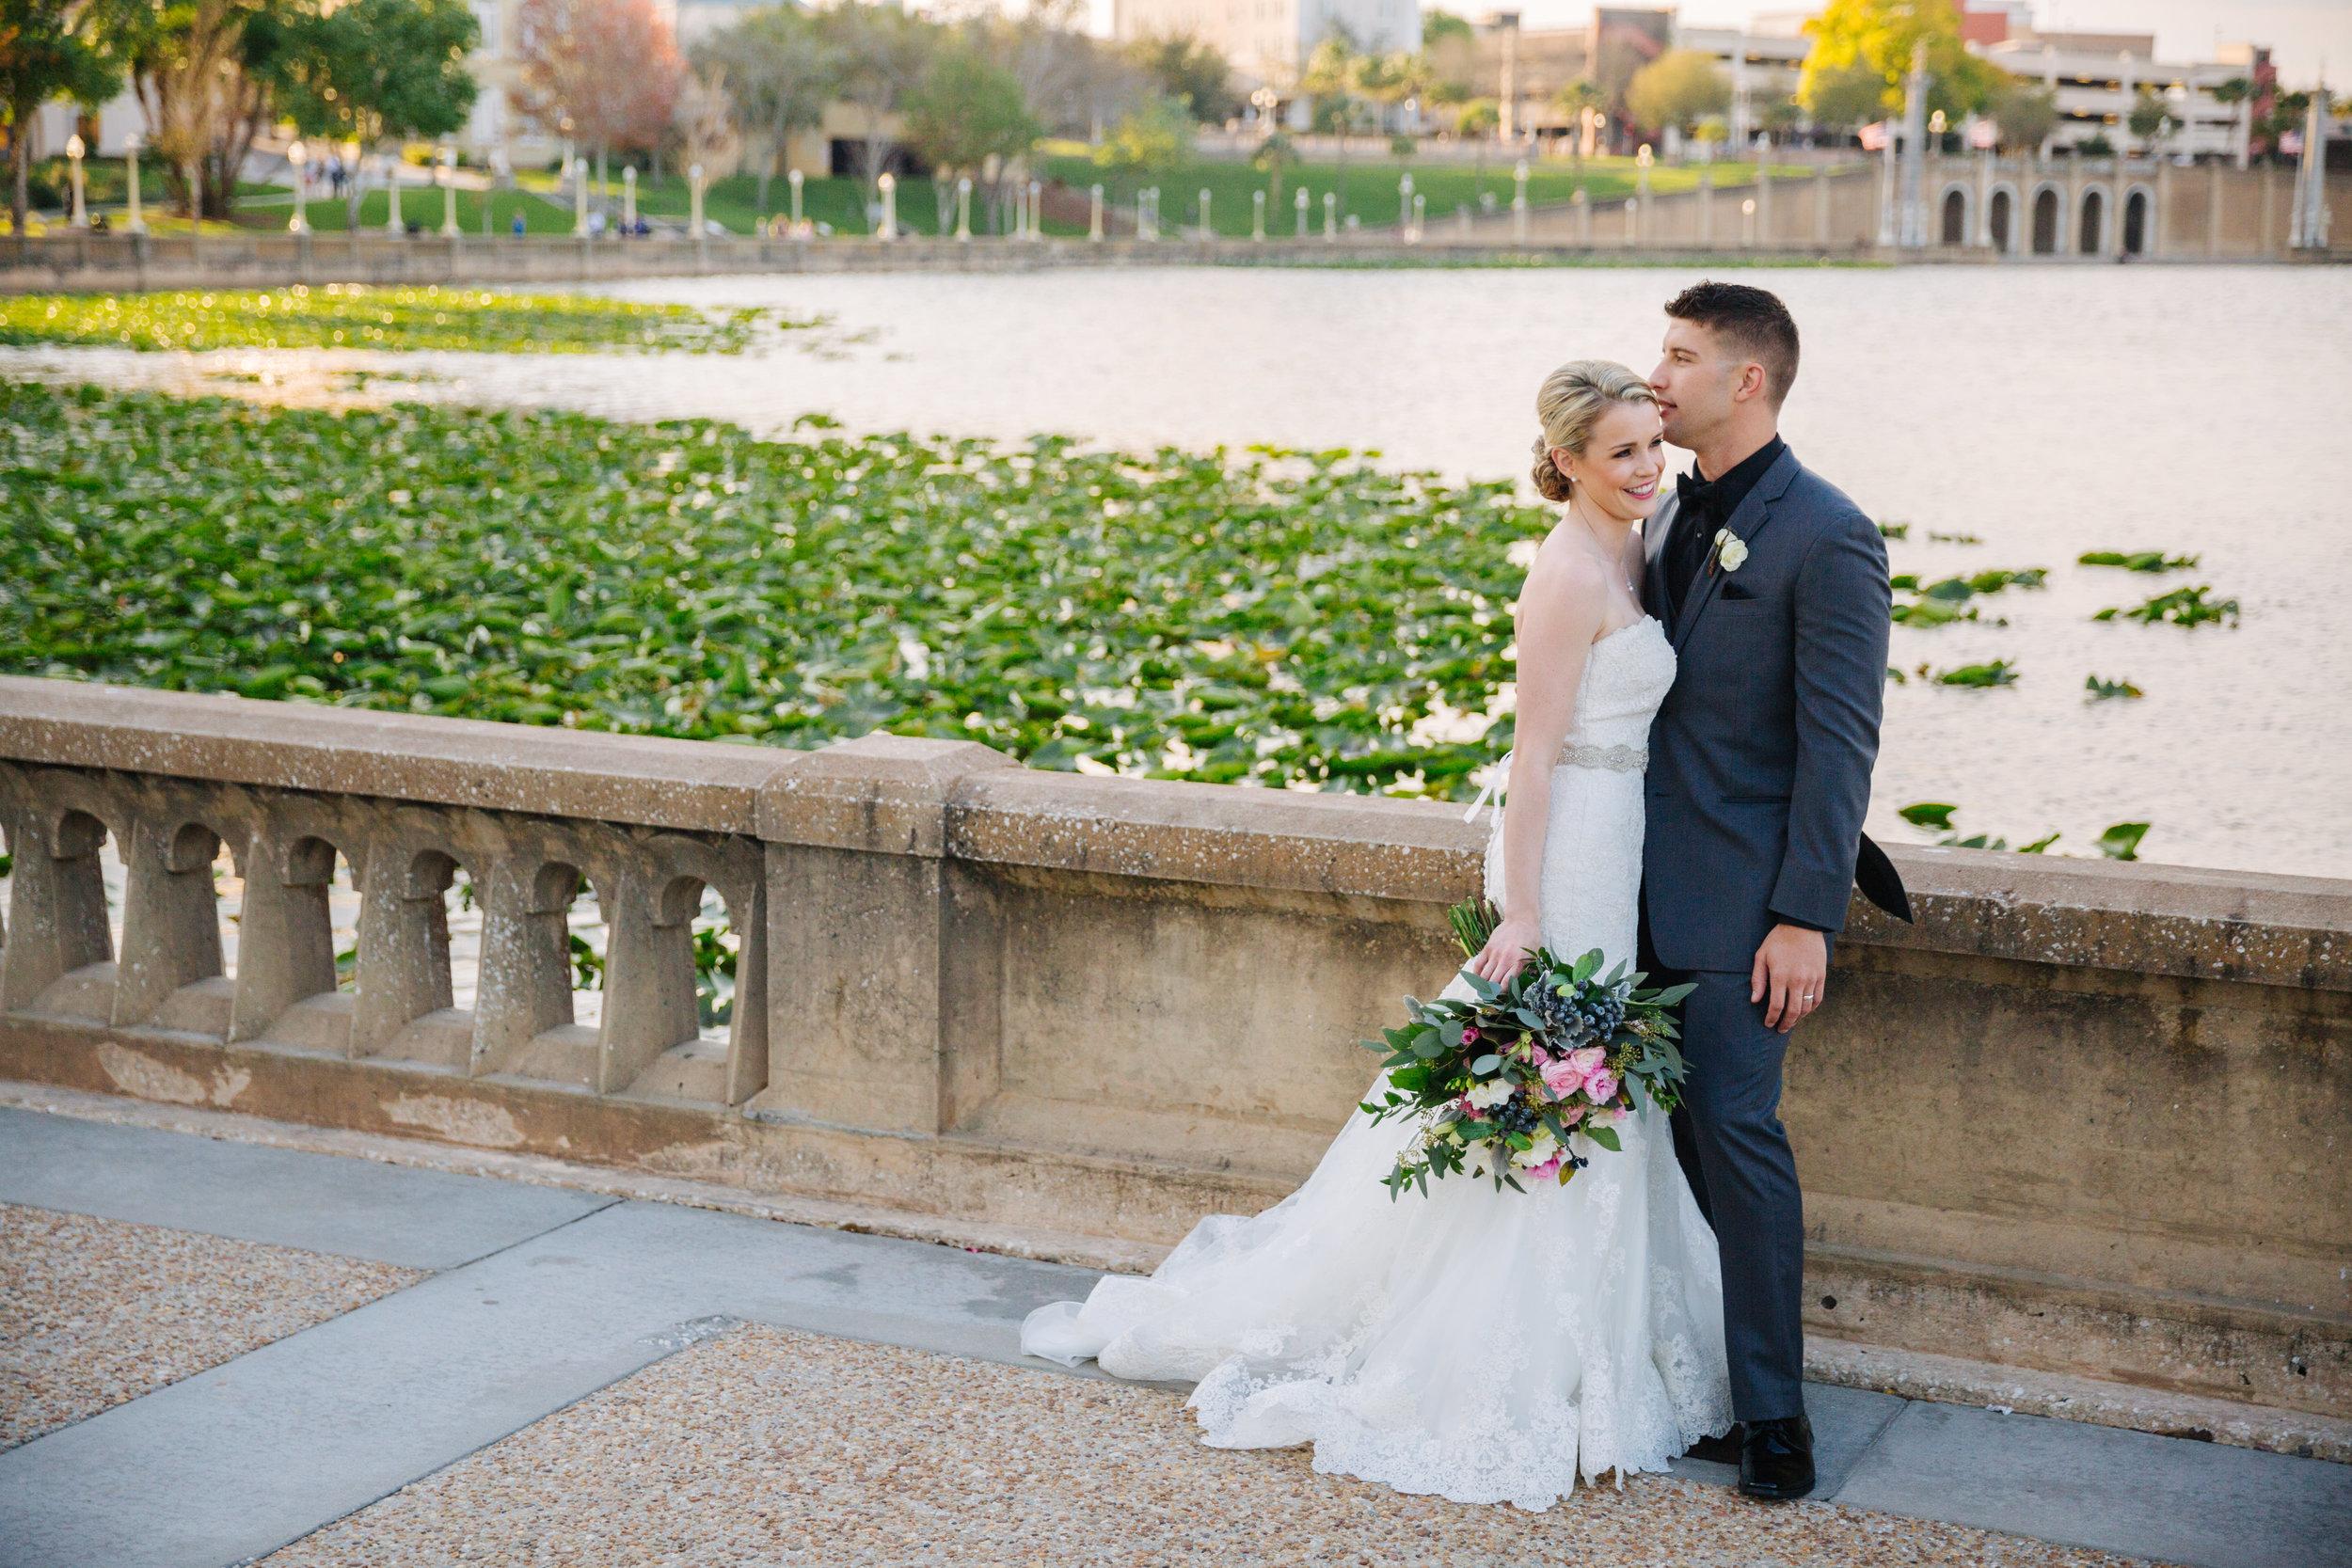 hollis gardens wedding downtown lakeland wedding jake and katie photography-39.jpg